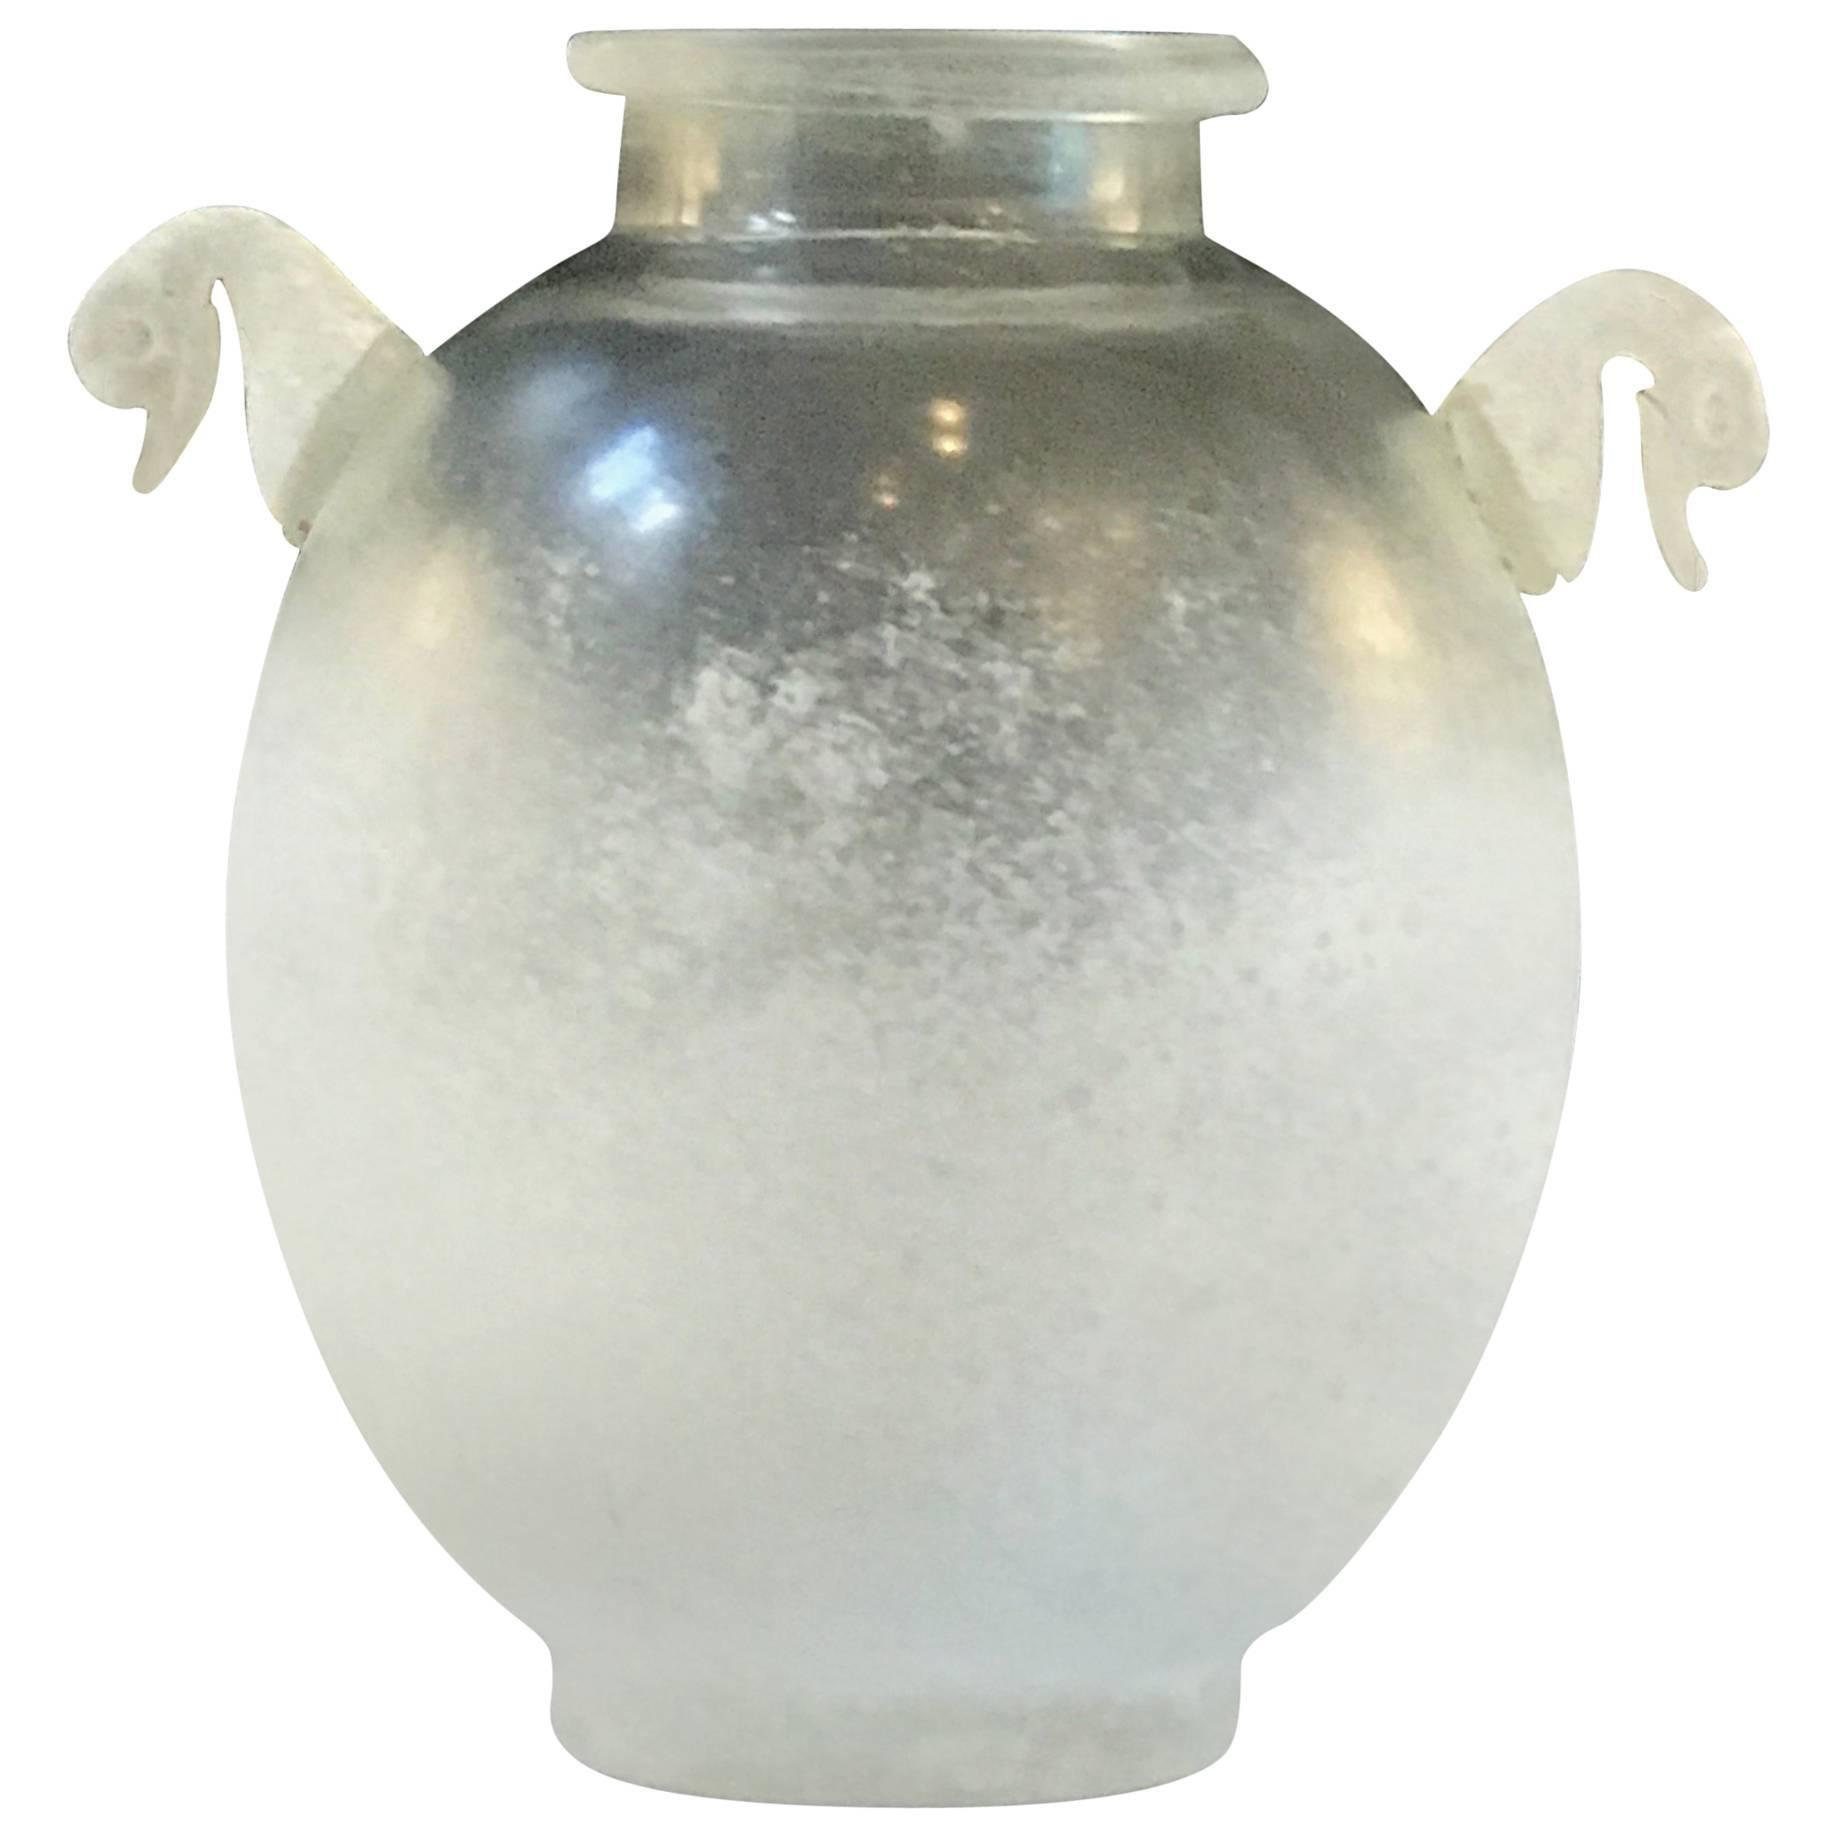 Seguso Vetri d'Arte Scavo Glass Handled Vase, Attributed to Flavio Poli